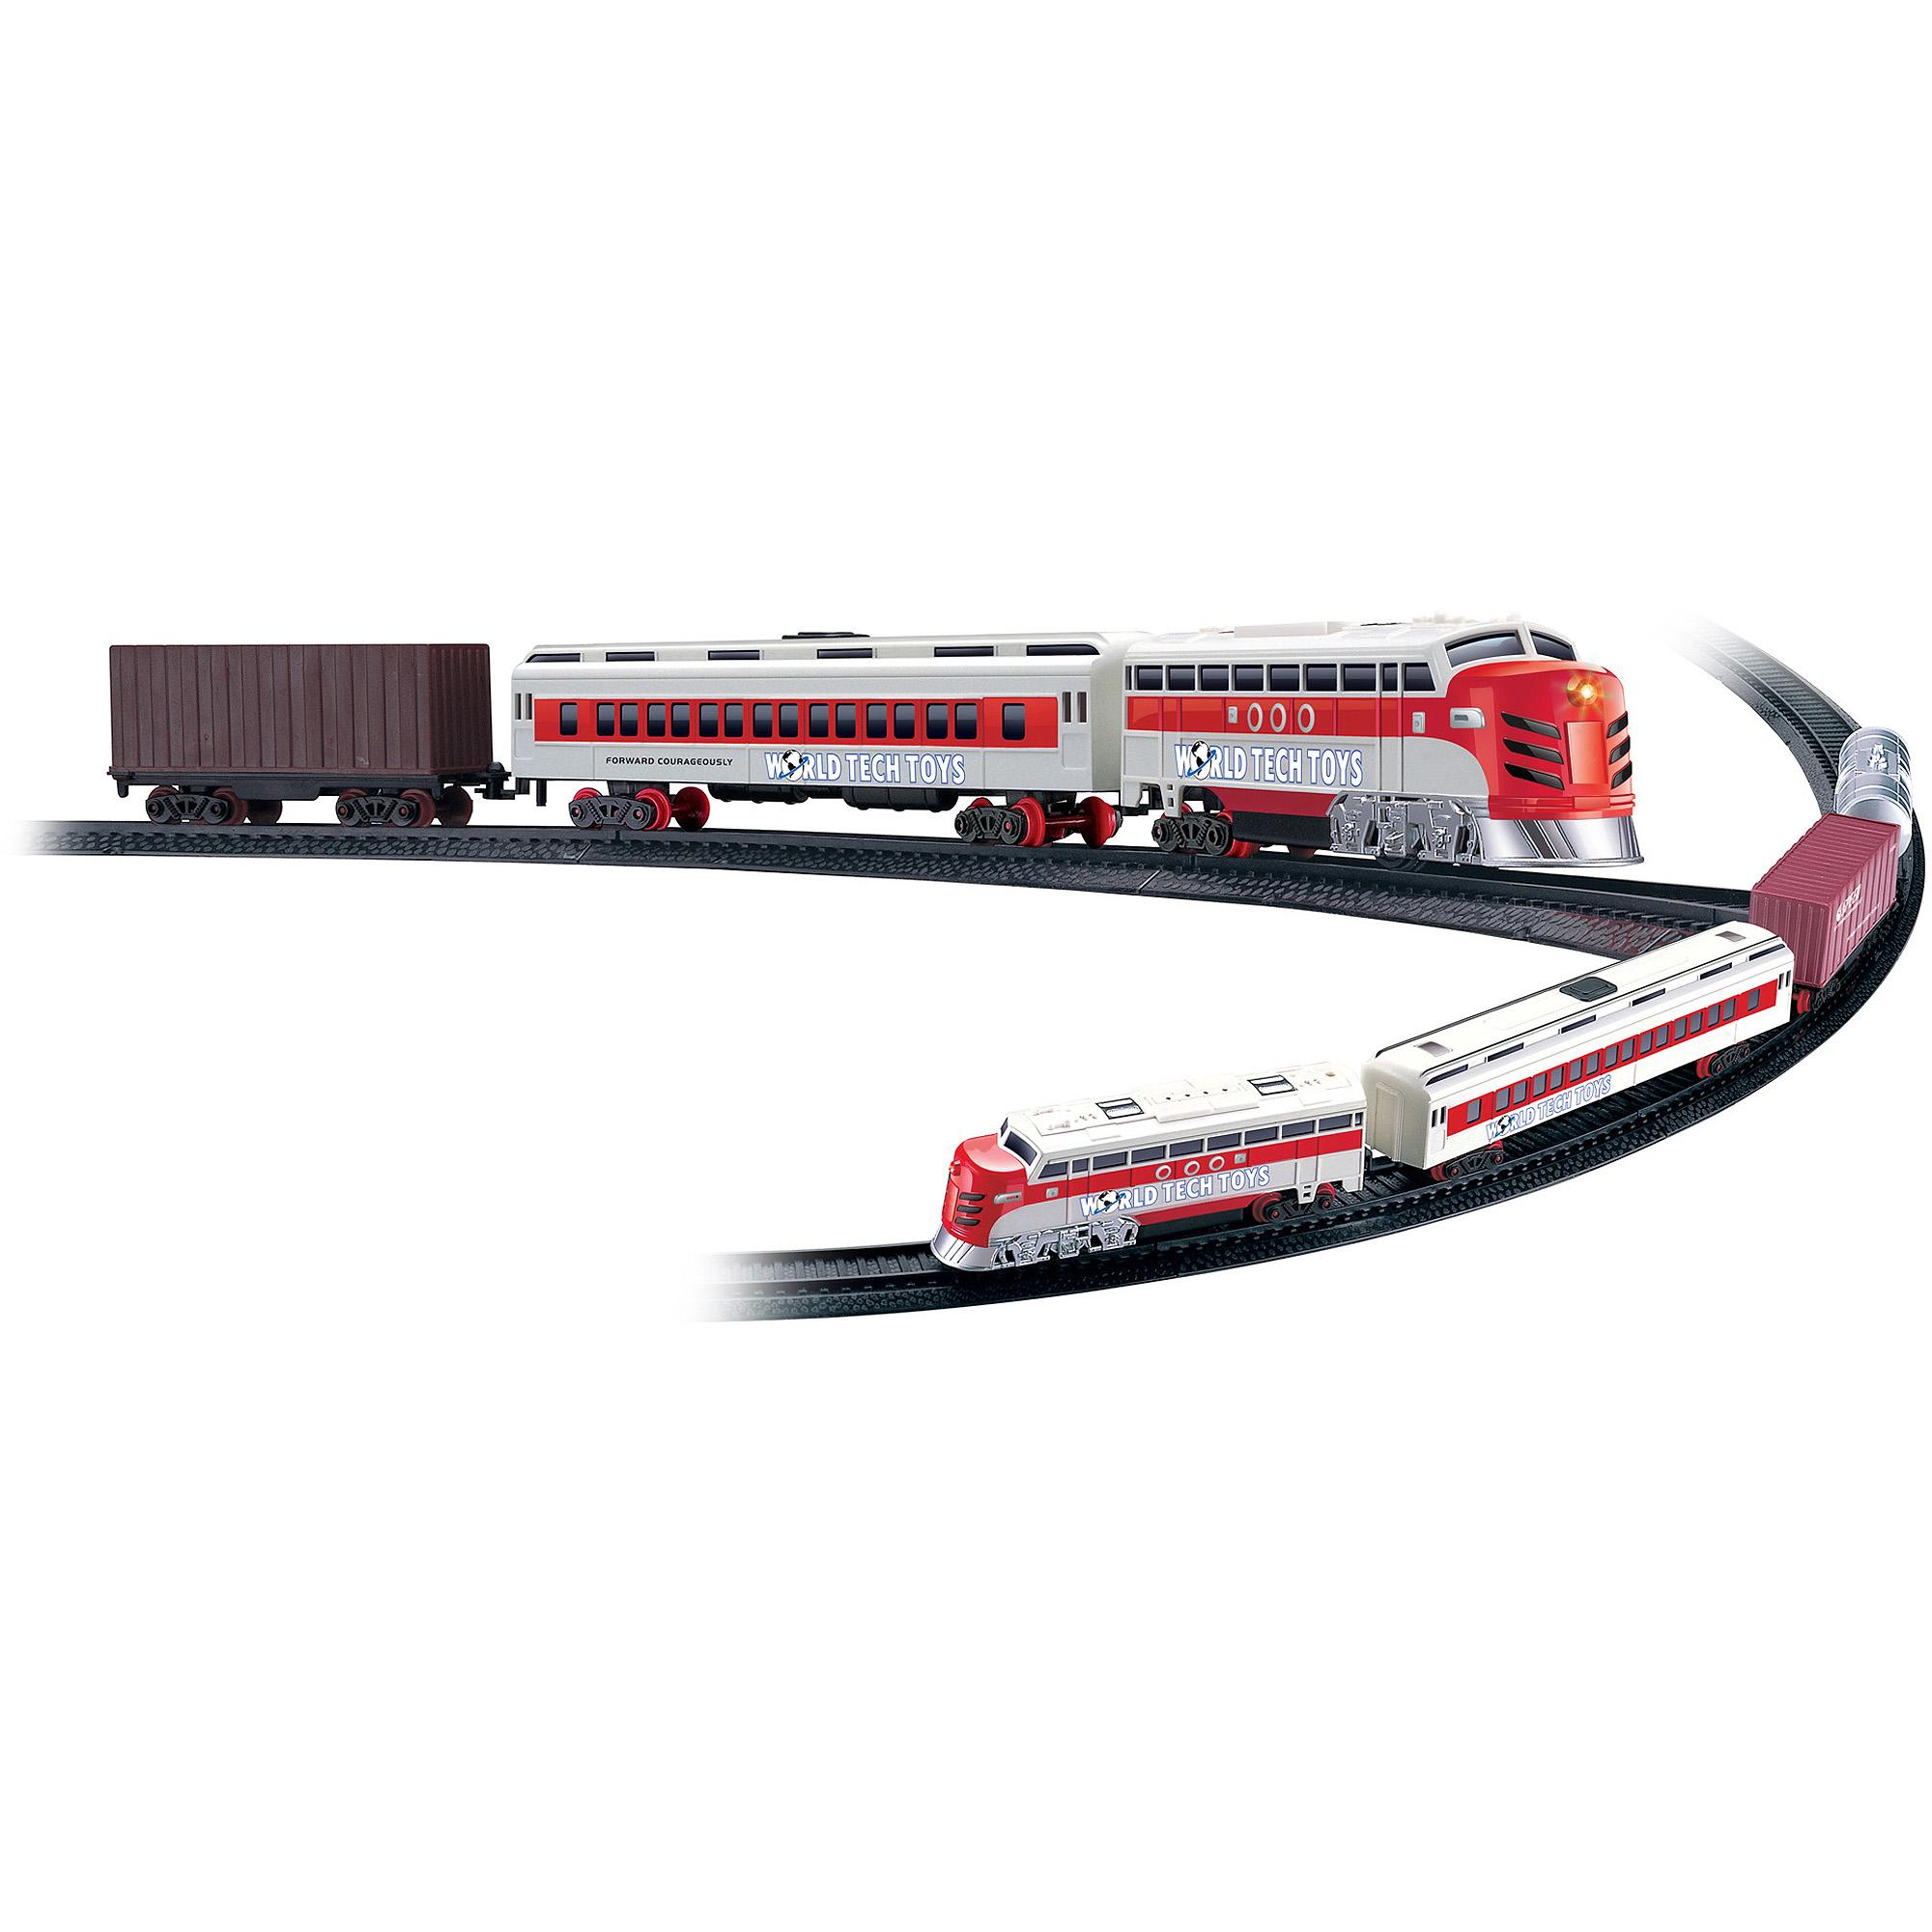 World Tech Toys Electric Luxury Lights & Sounds Train Set